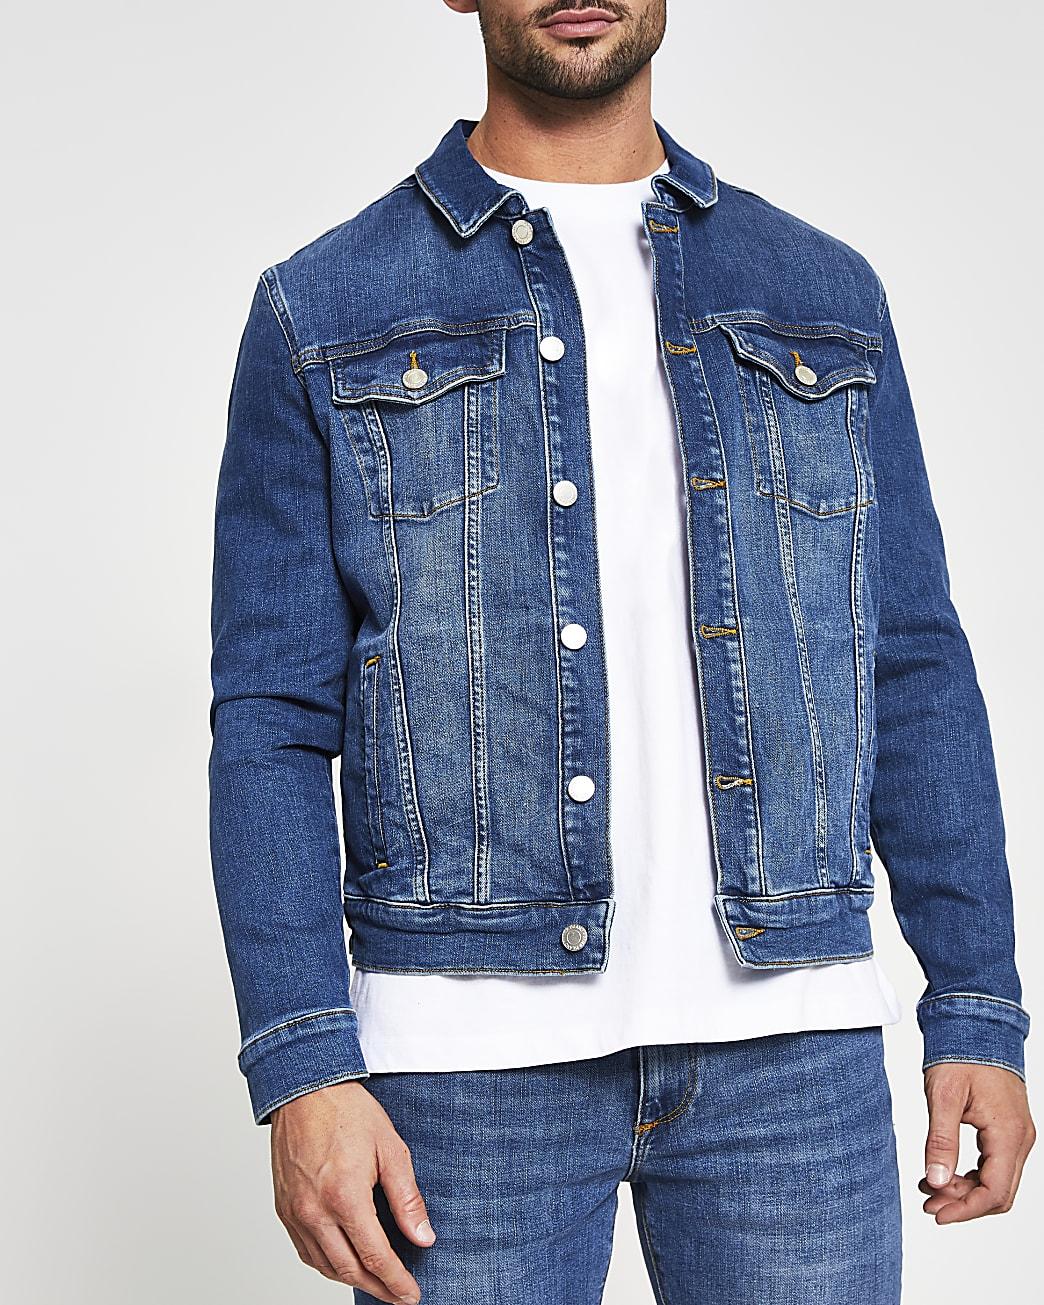 Blue classic denim jacket